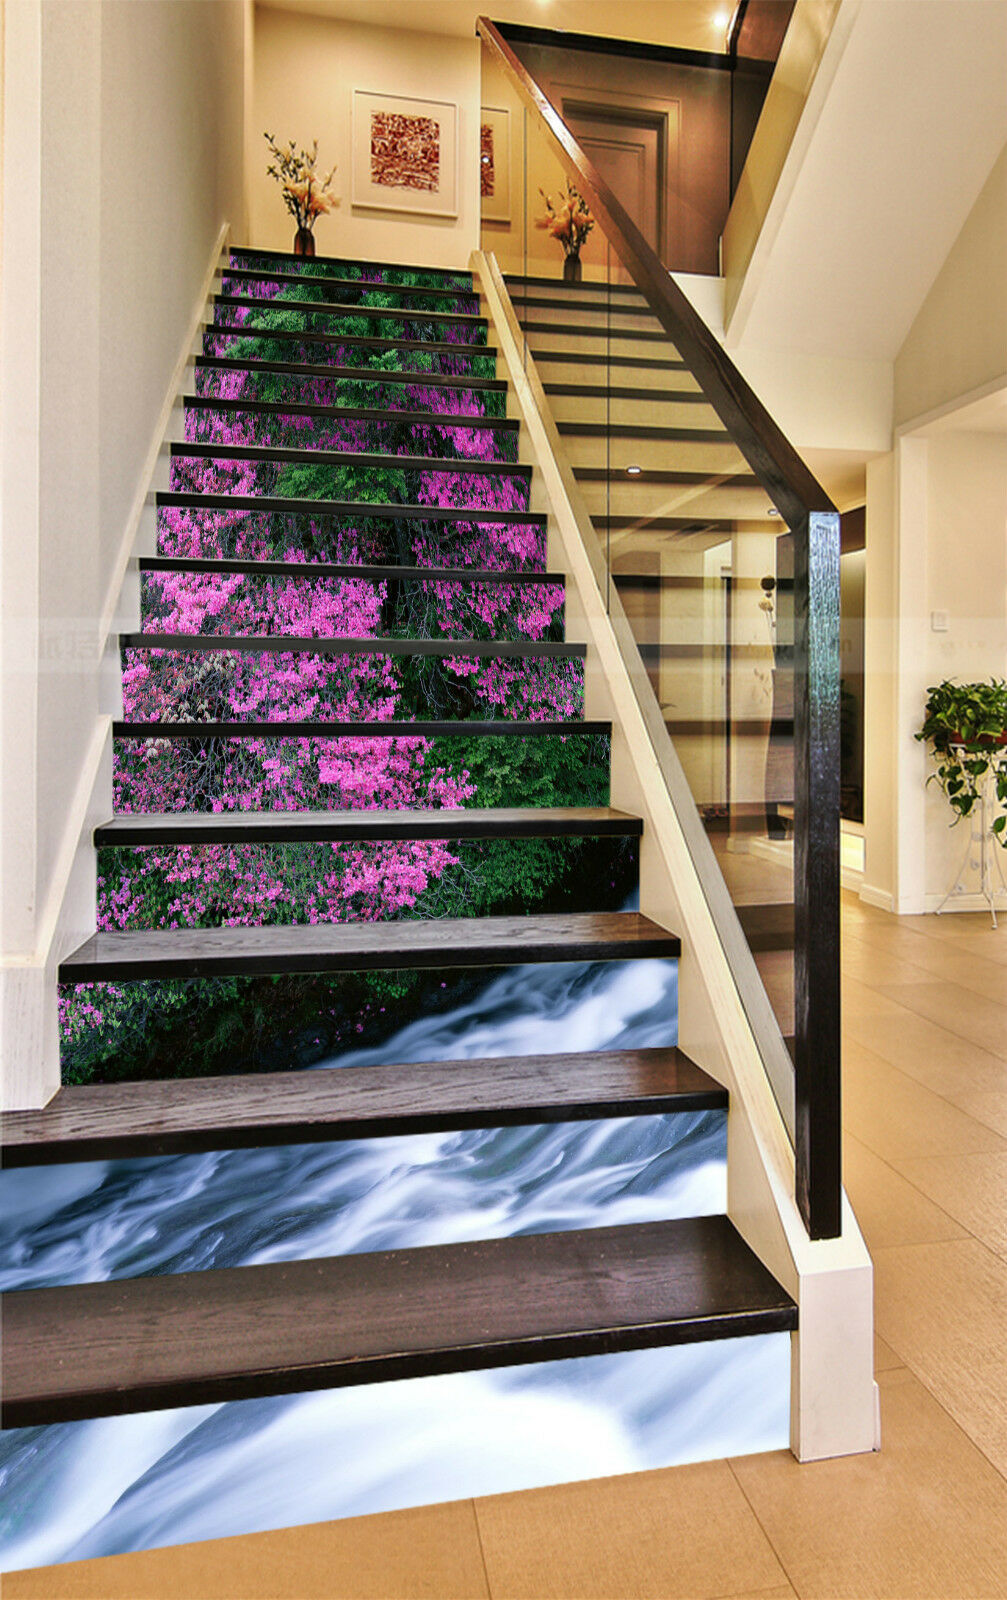 3D blueme Strom 437 Stair Risers Dekoration Fototapete Vinyl Aufkleber Tapete DE